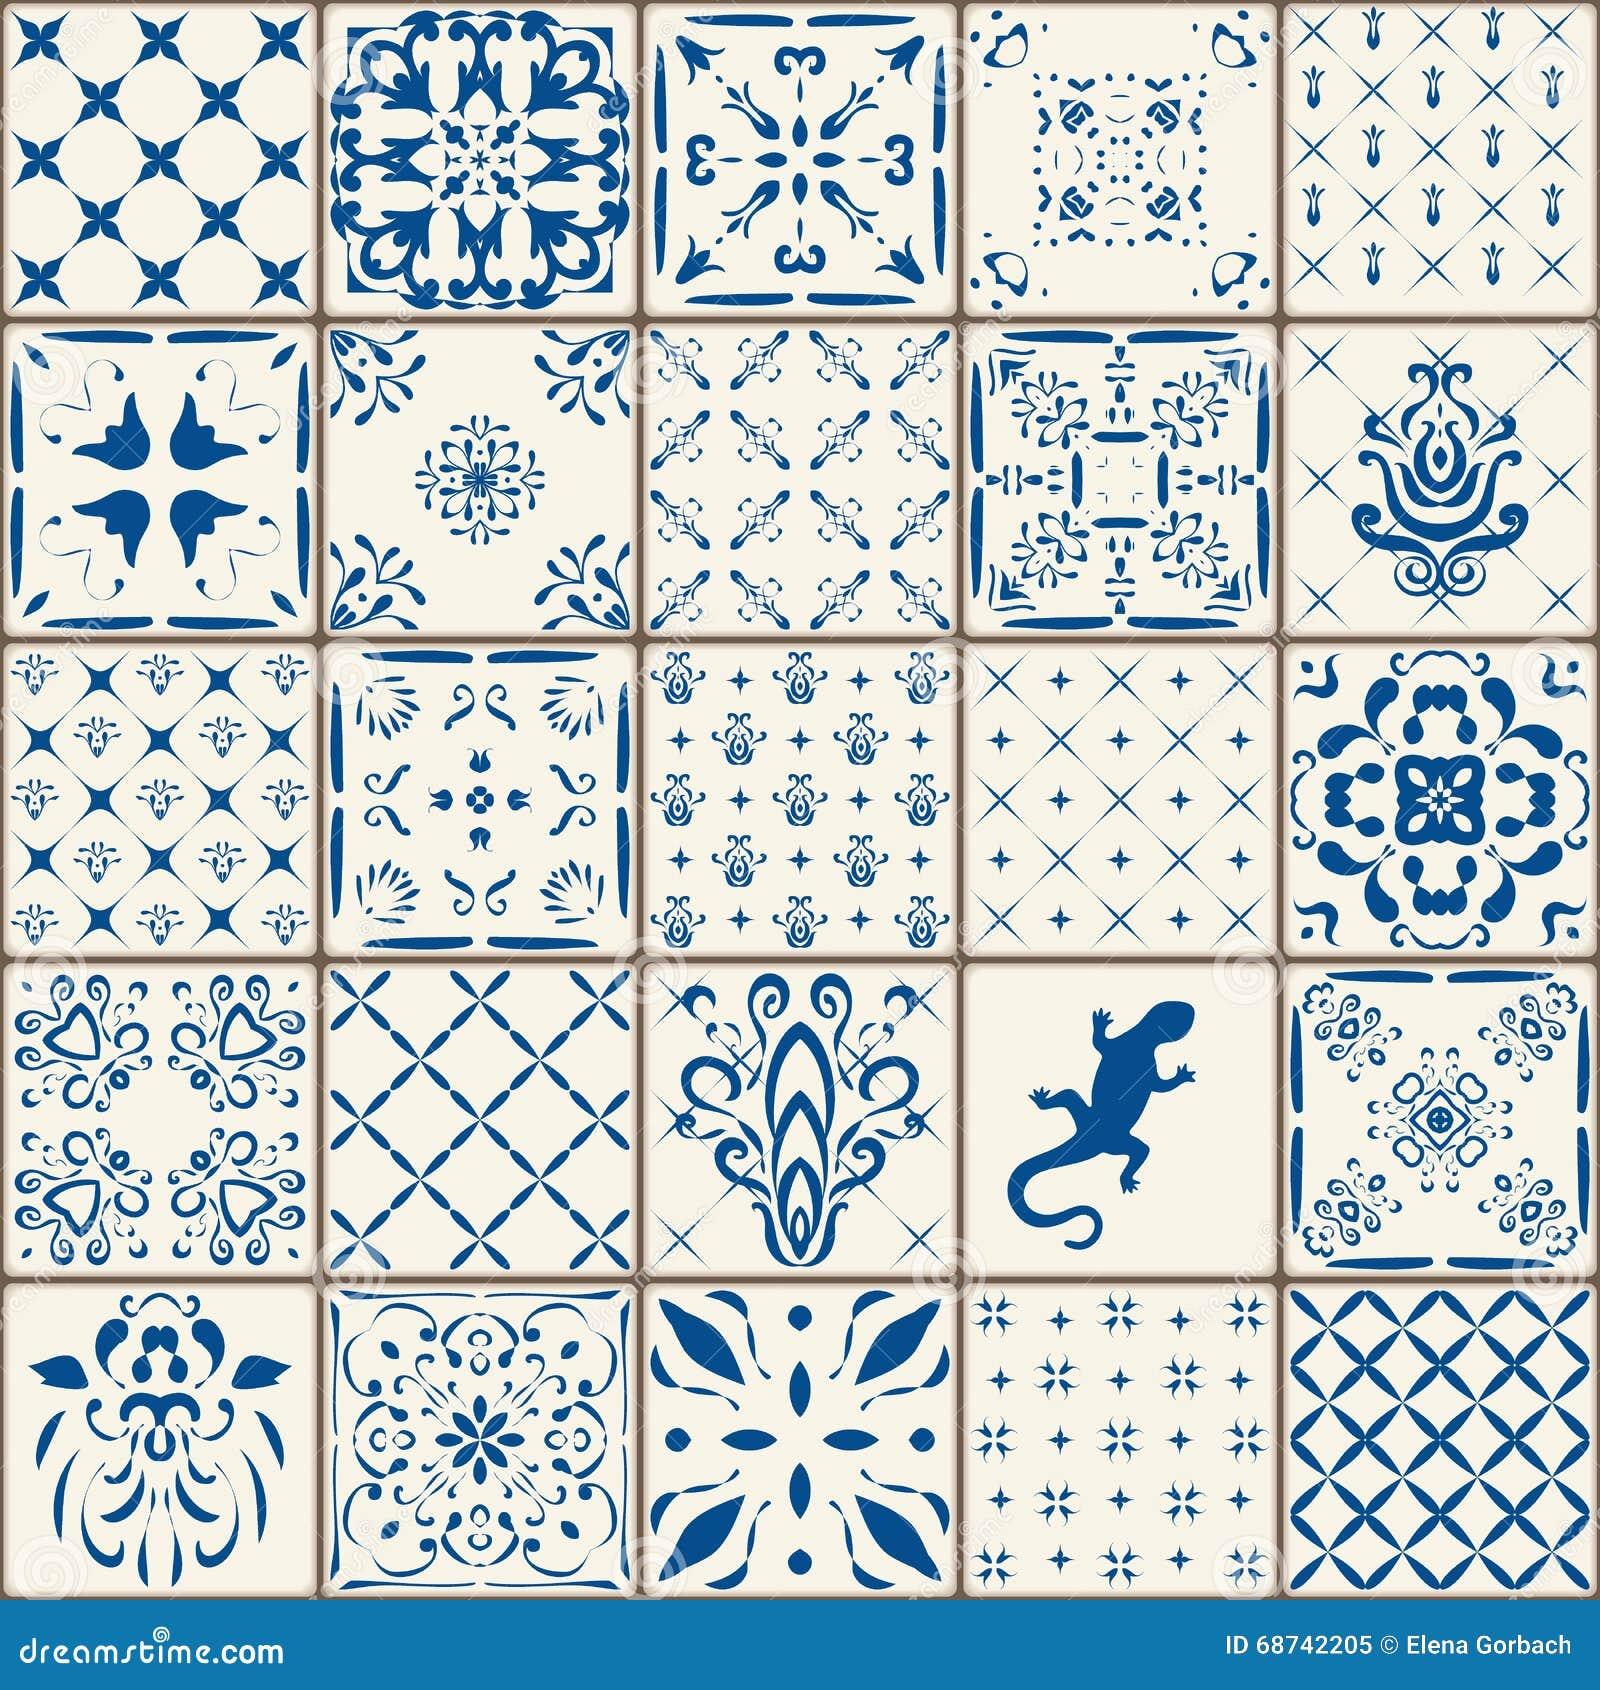 Beste Küchenfliese Muster Boden Ideen - Küchenschrank Ideen ...